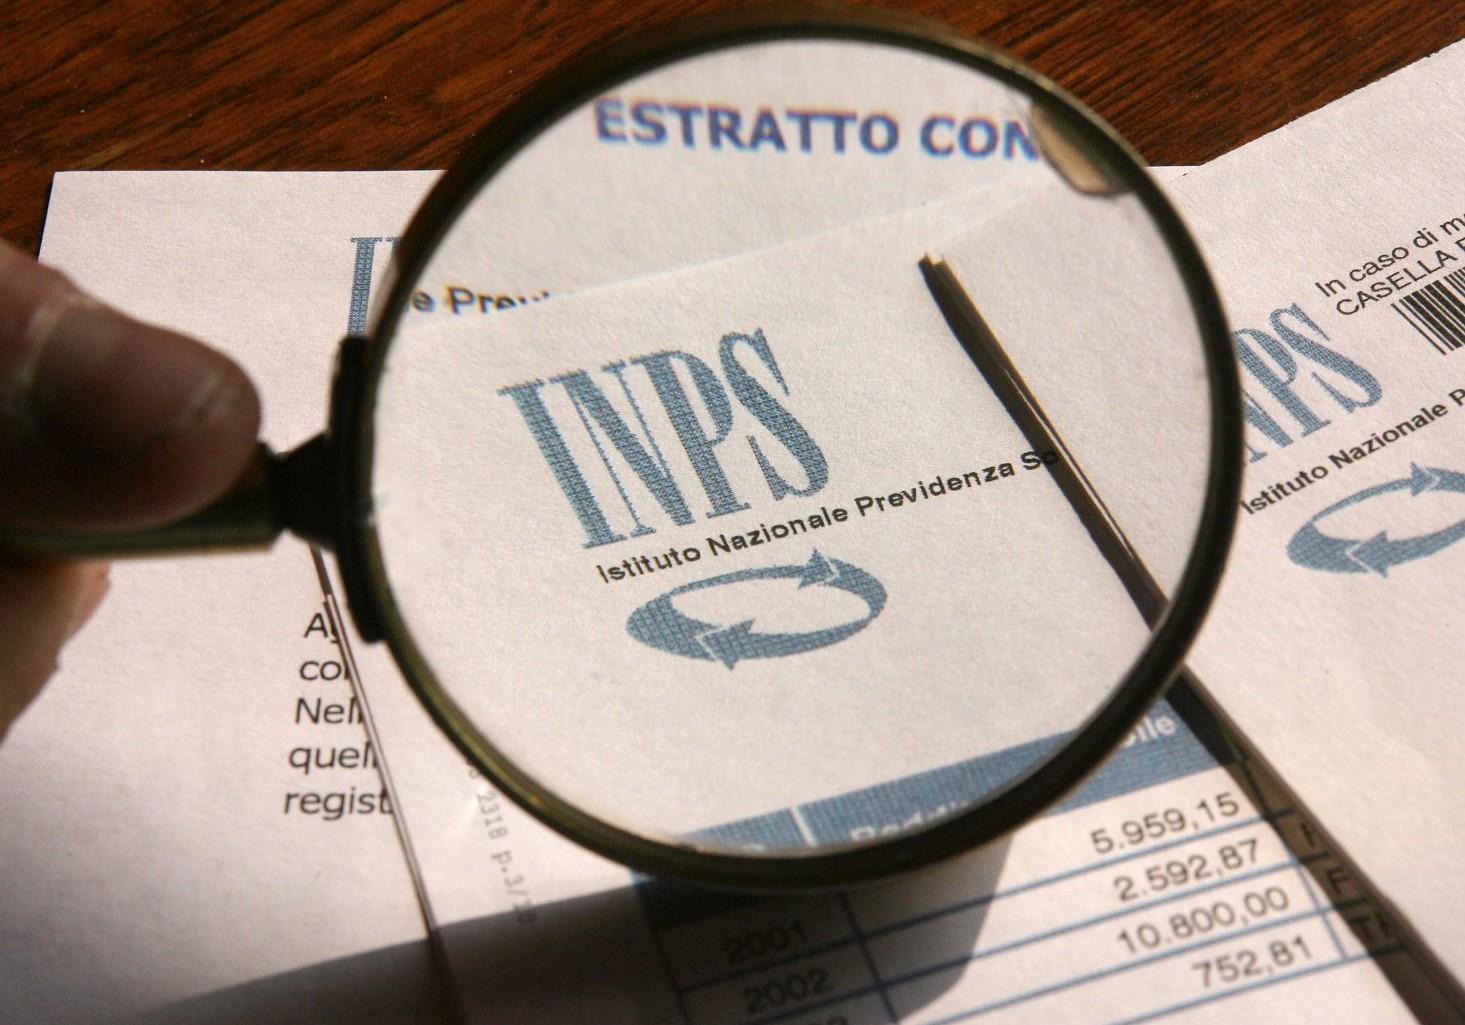 Pensioni anticipate 2019 legge ufficiale